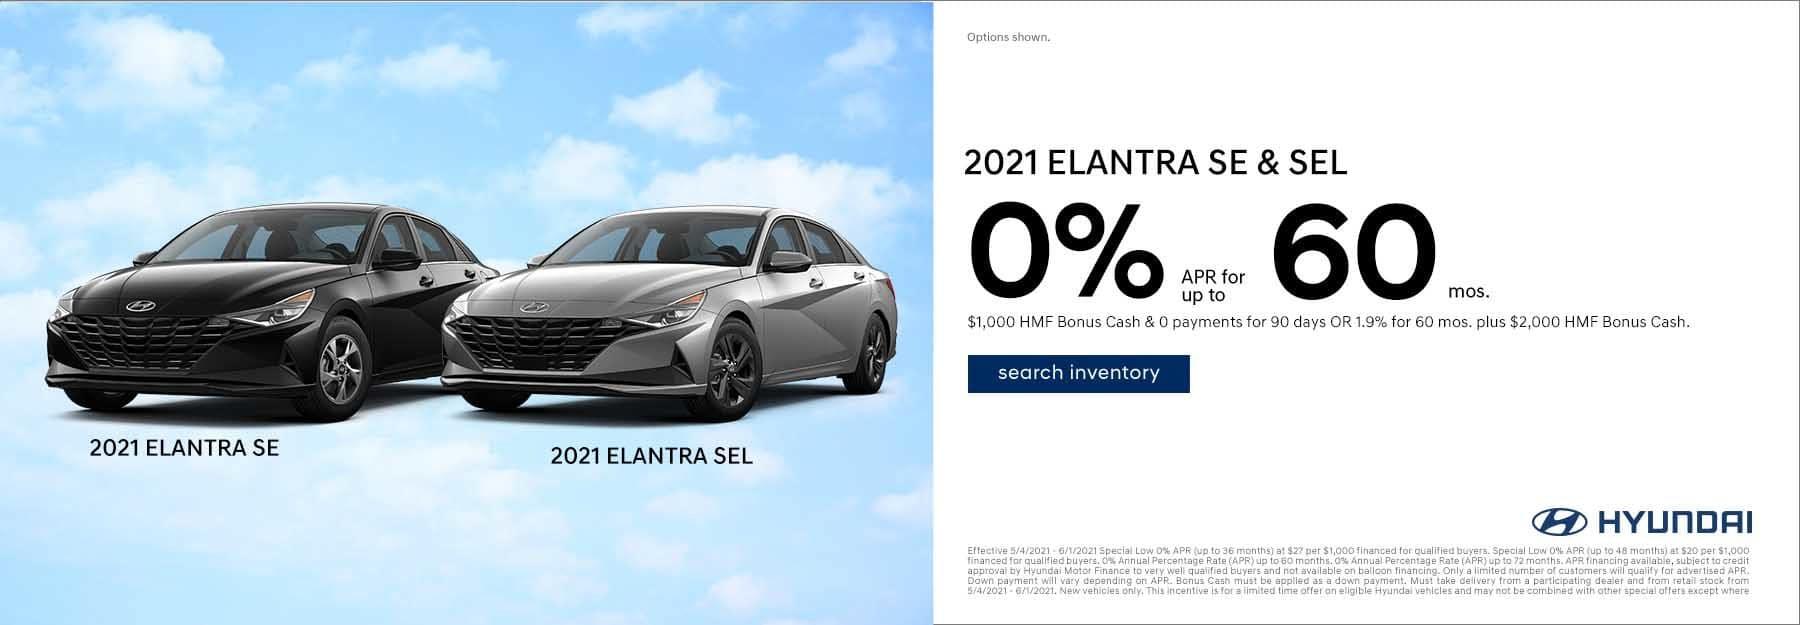 2021 black Hyundai Elantra SE & 2021 Metal Hyundai Elantra SEL